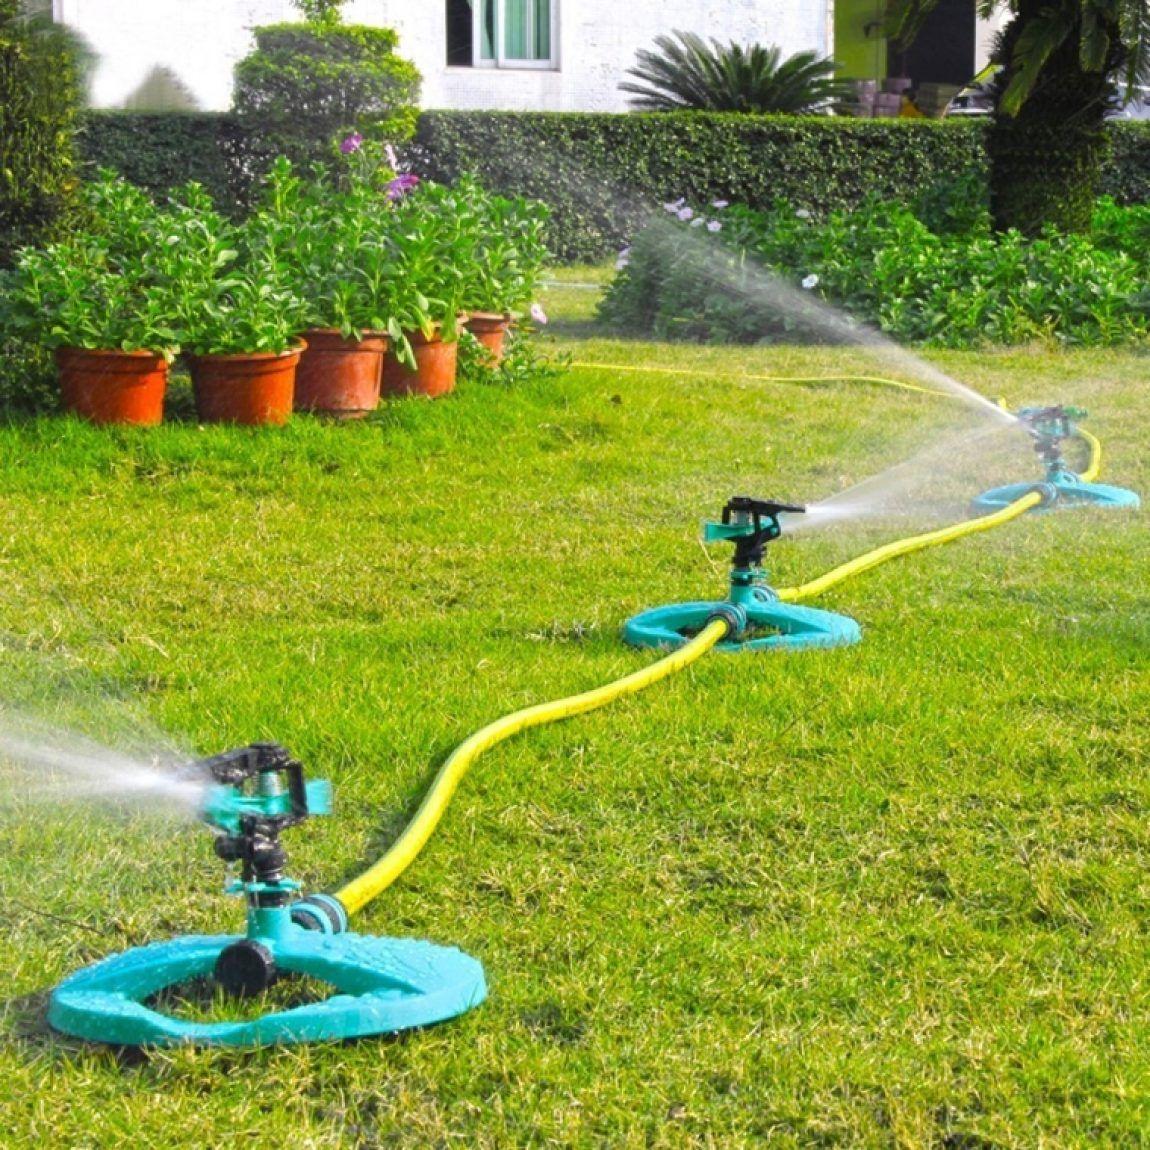 Water Sprinkler System Impulse Long Range Sprinklers